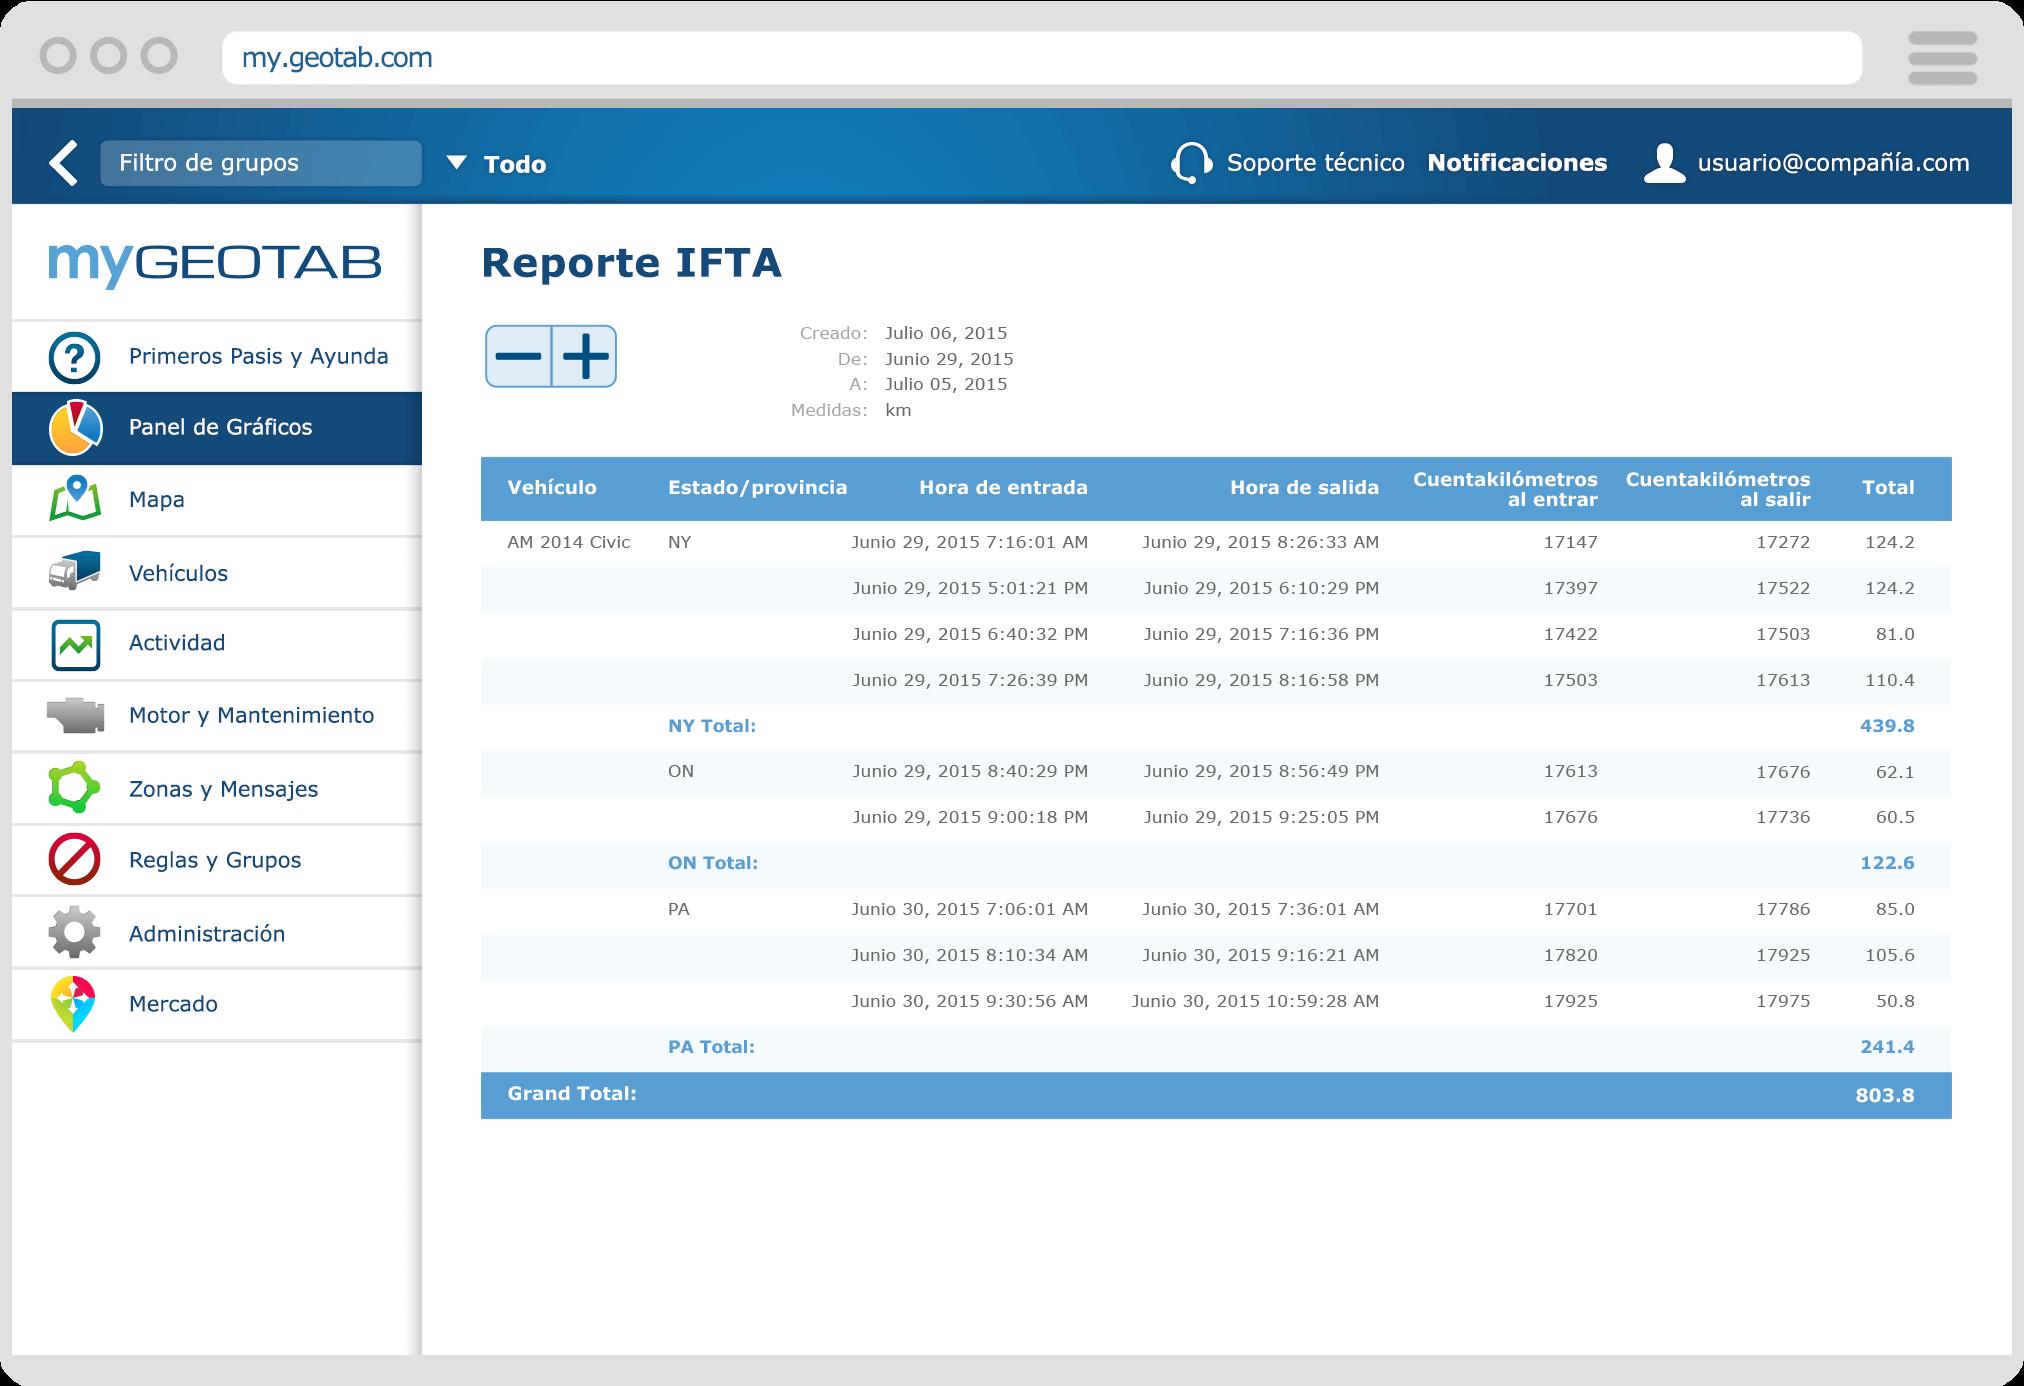 Reporte IFTA